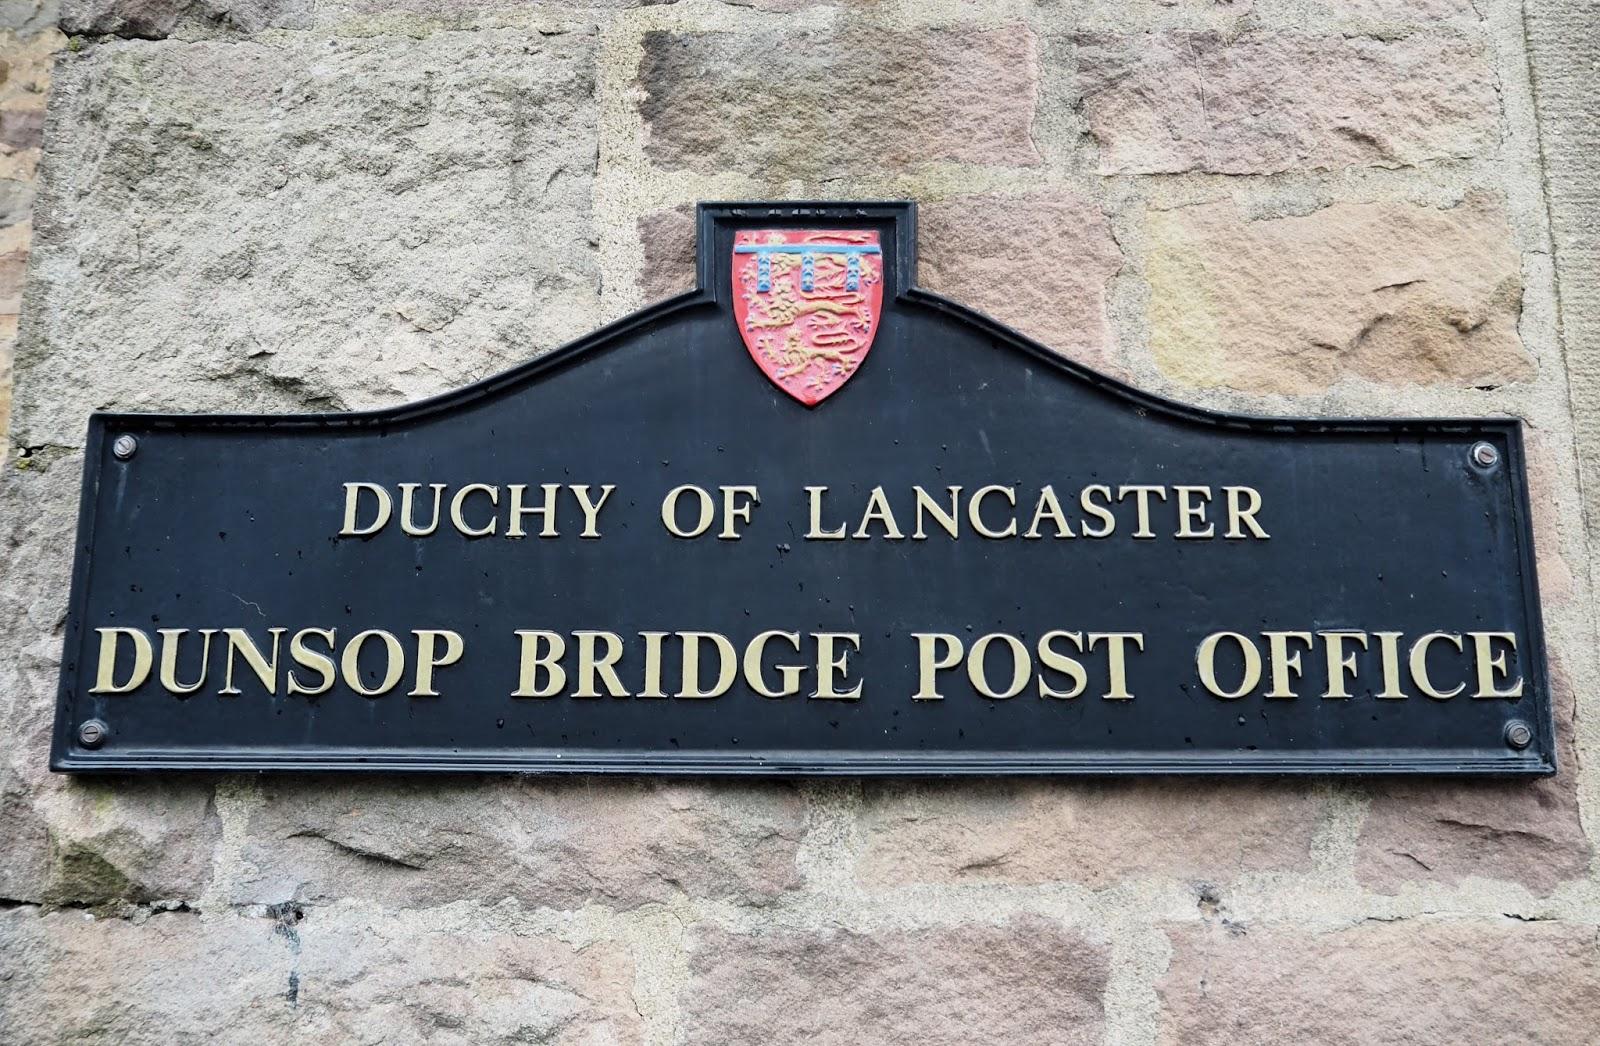 Dunsop Bridge post office